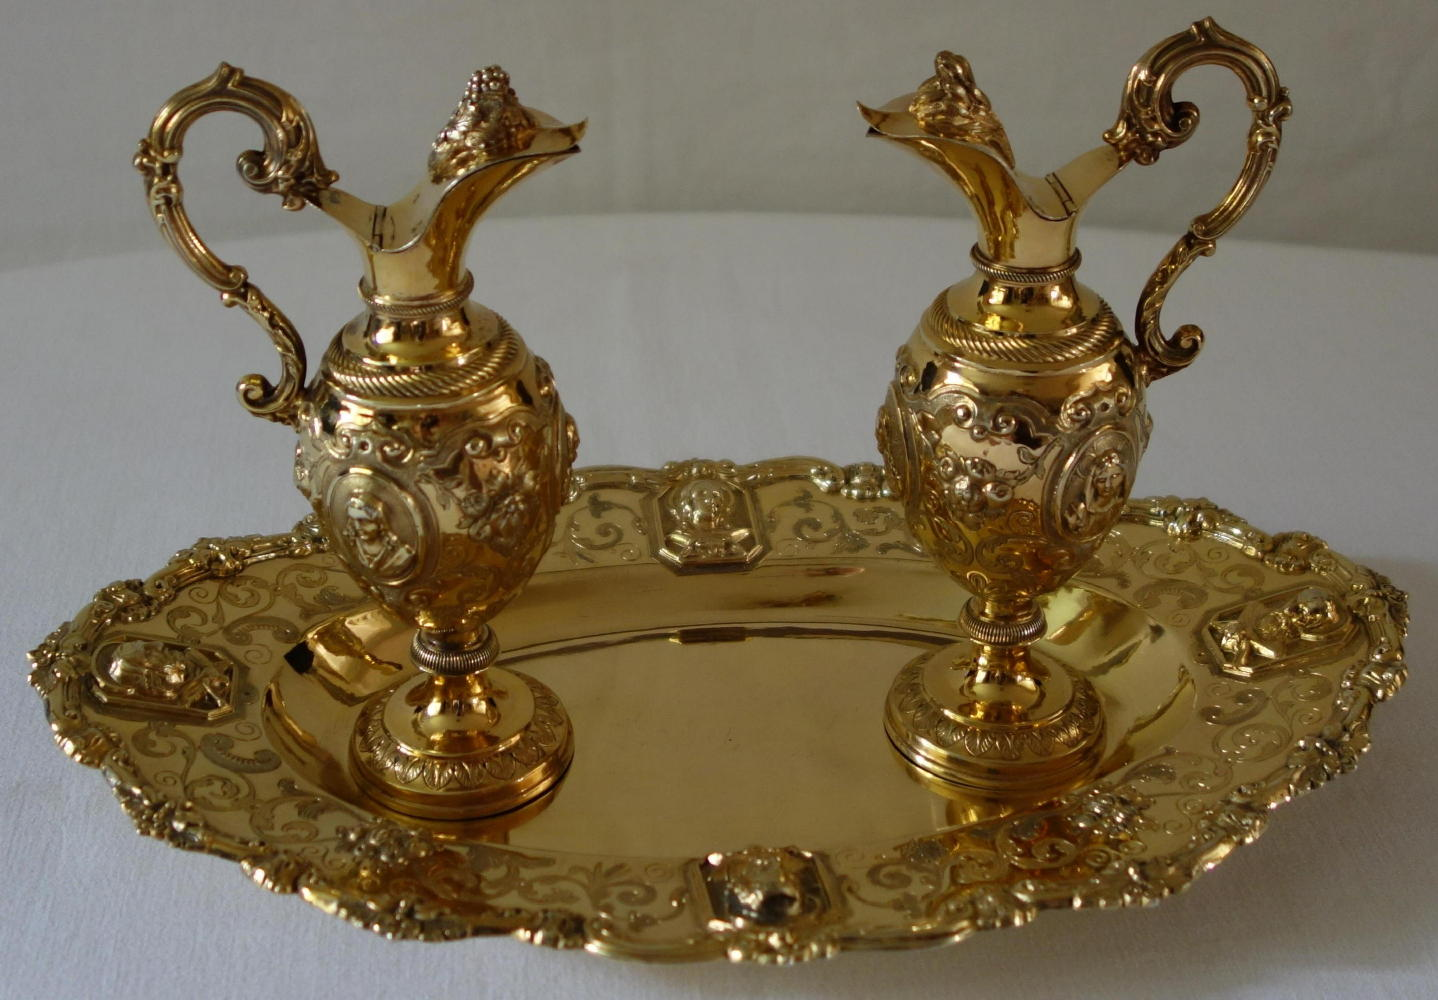 luzar vestments  church cruets crystal solid silver glass - solid silver gilt antique french baroque cruets